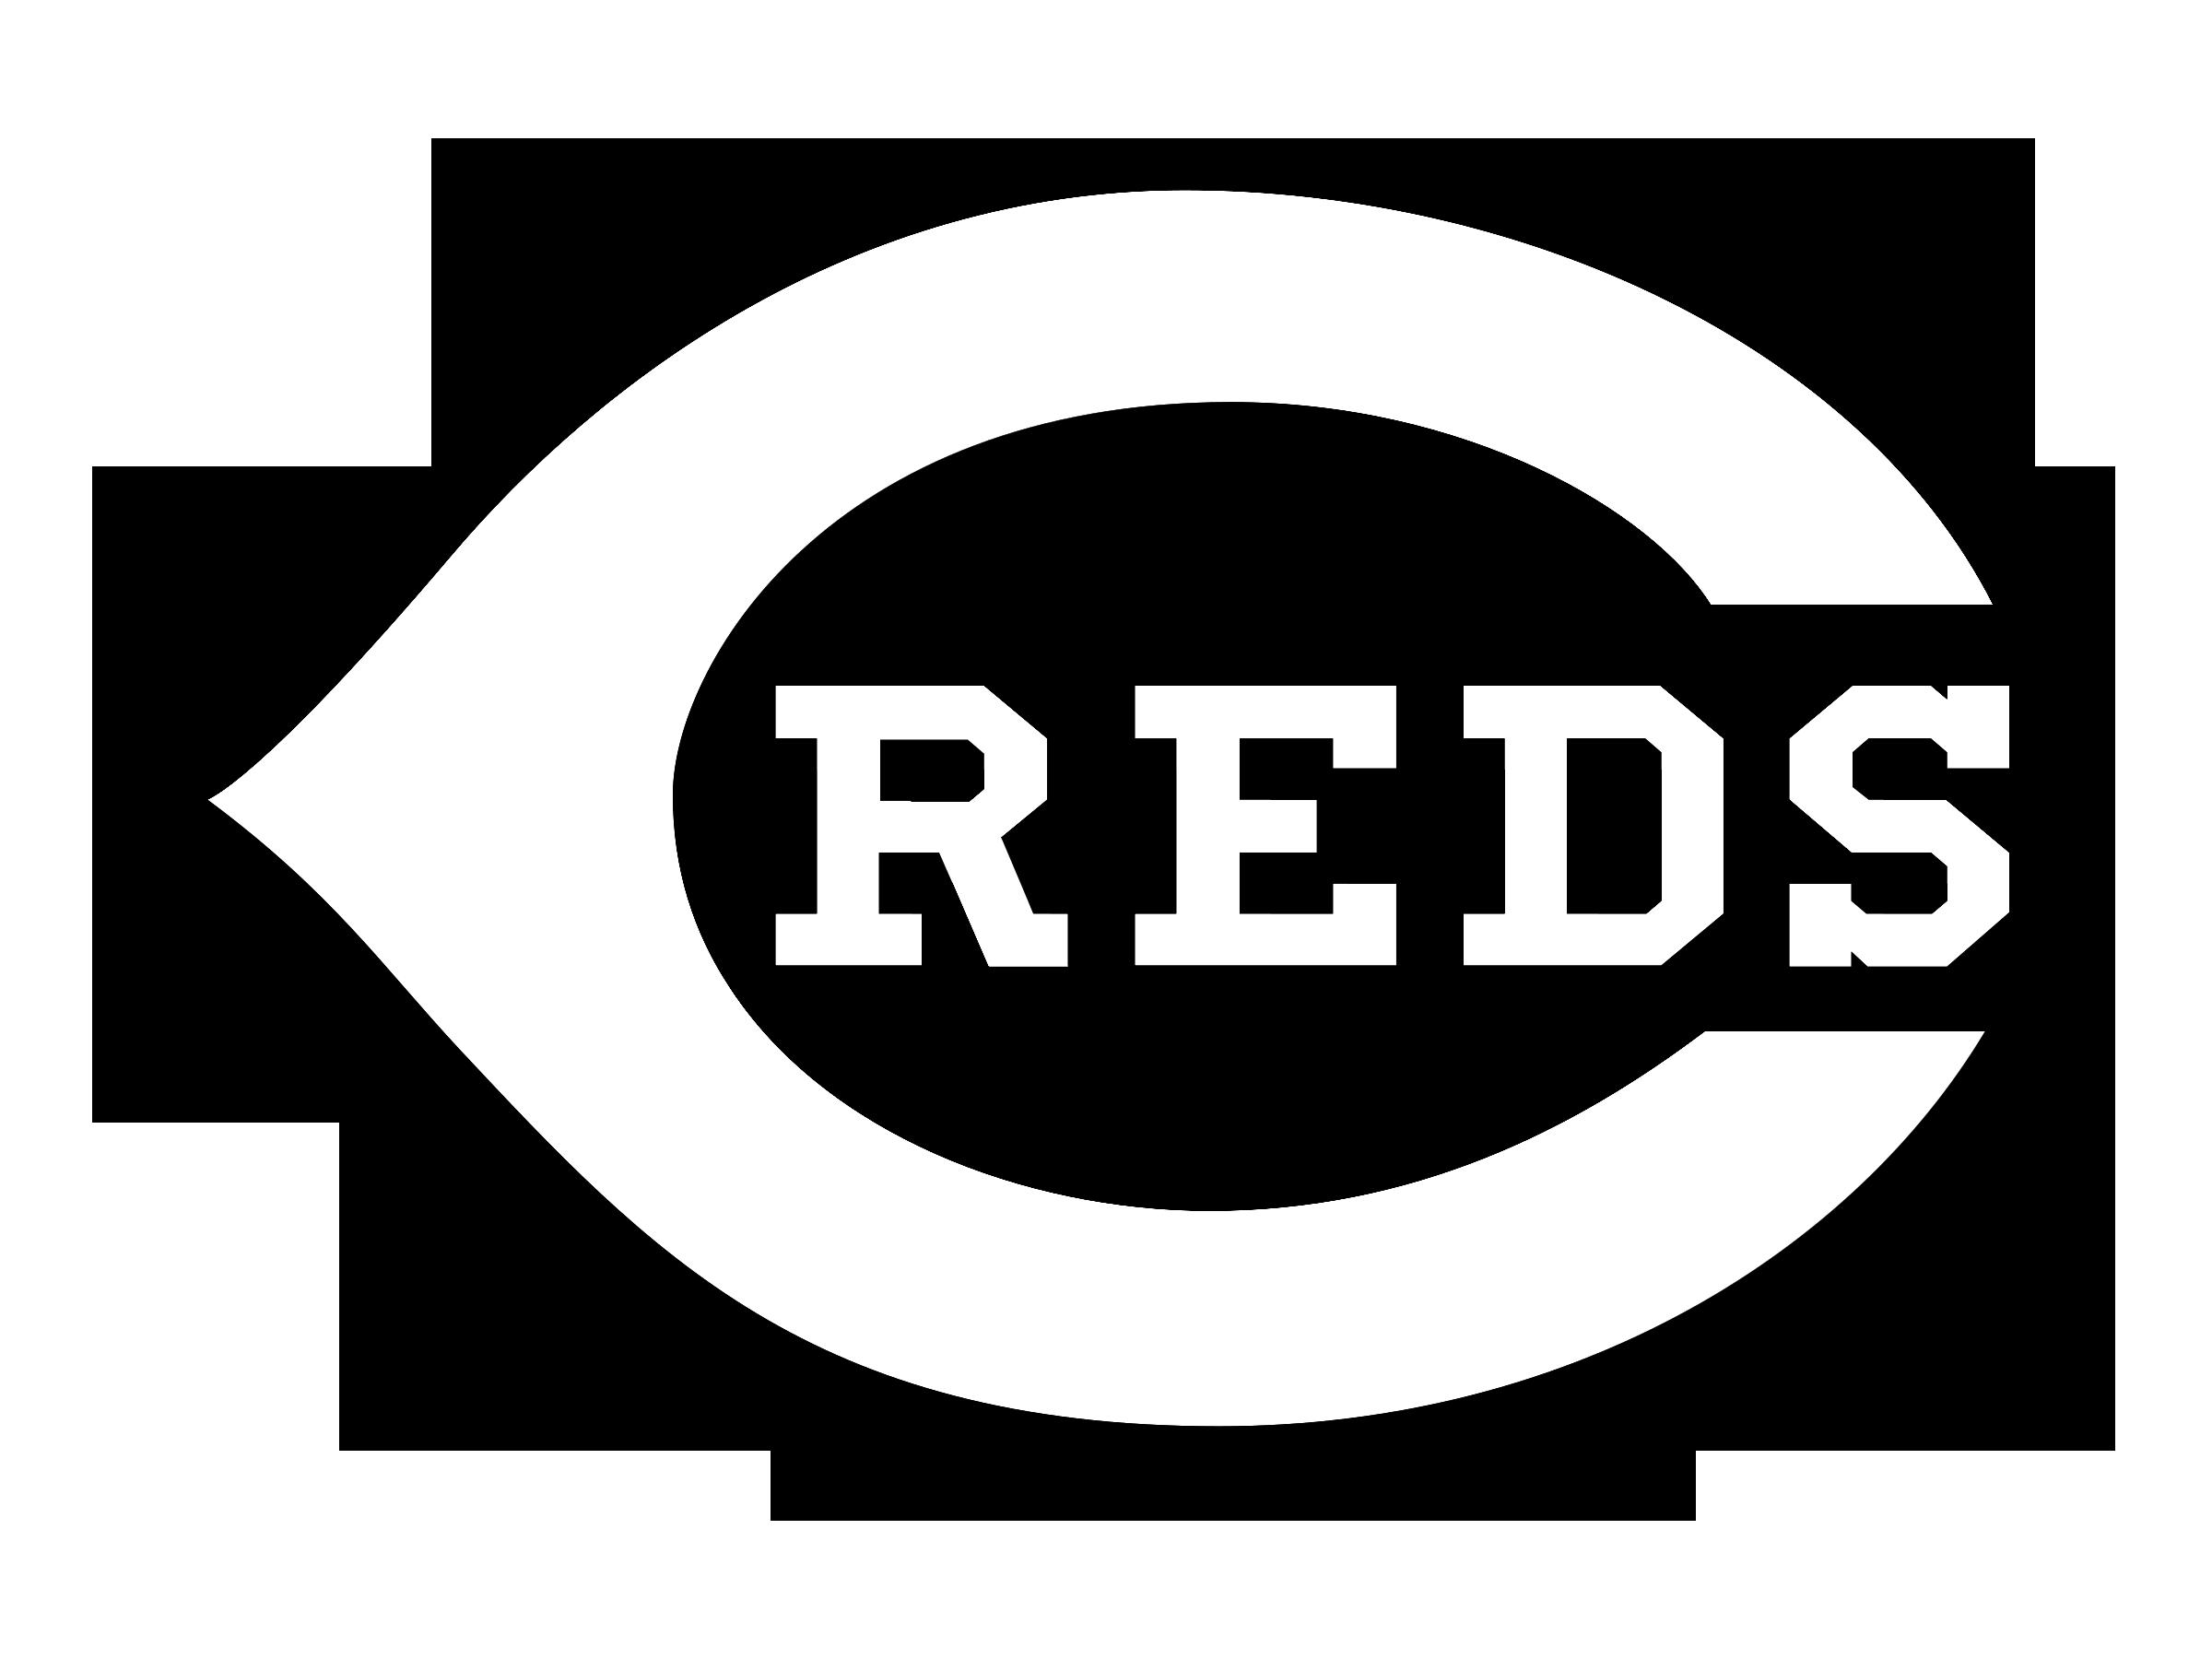 Cincinnati Reds logo black and white - Cincinnati Reds Logo Vector PNG